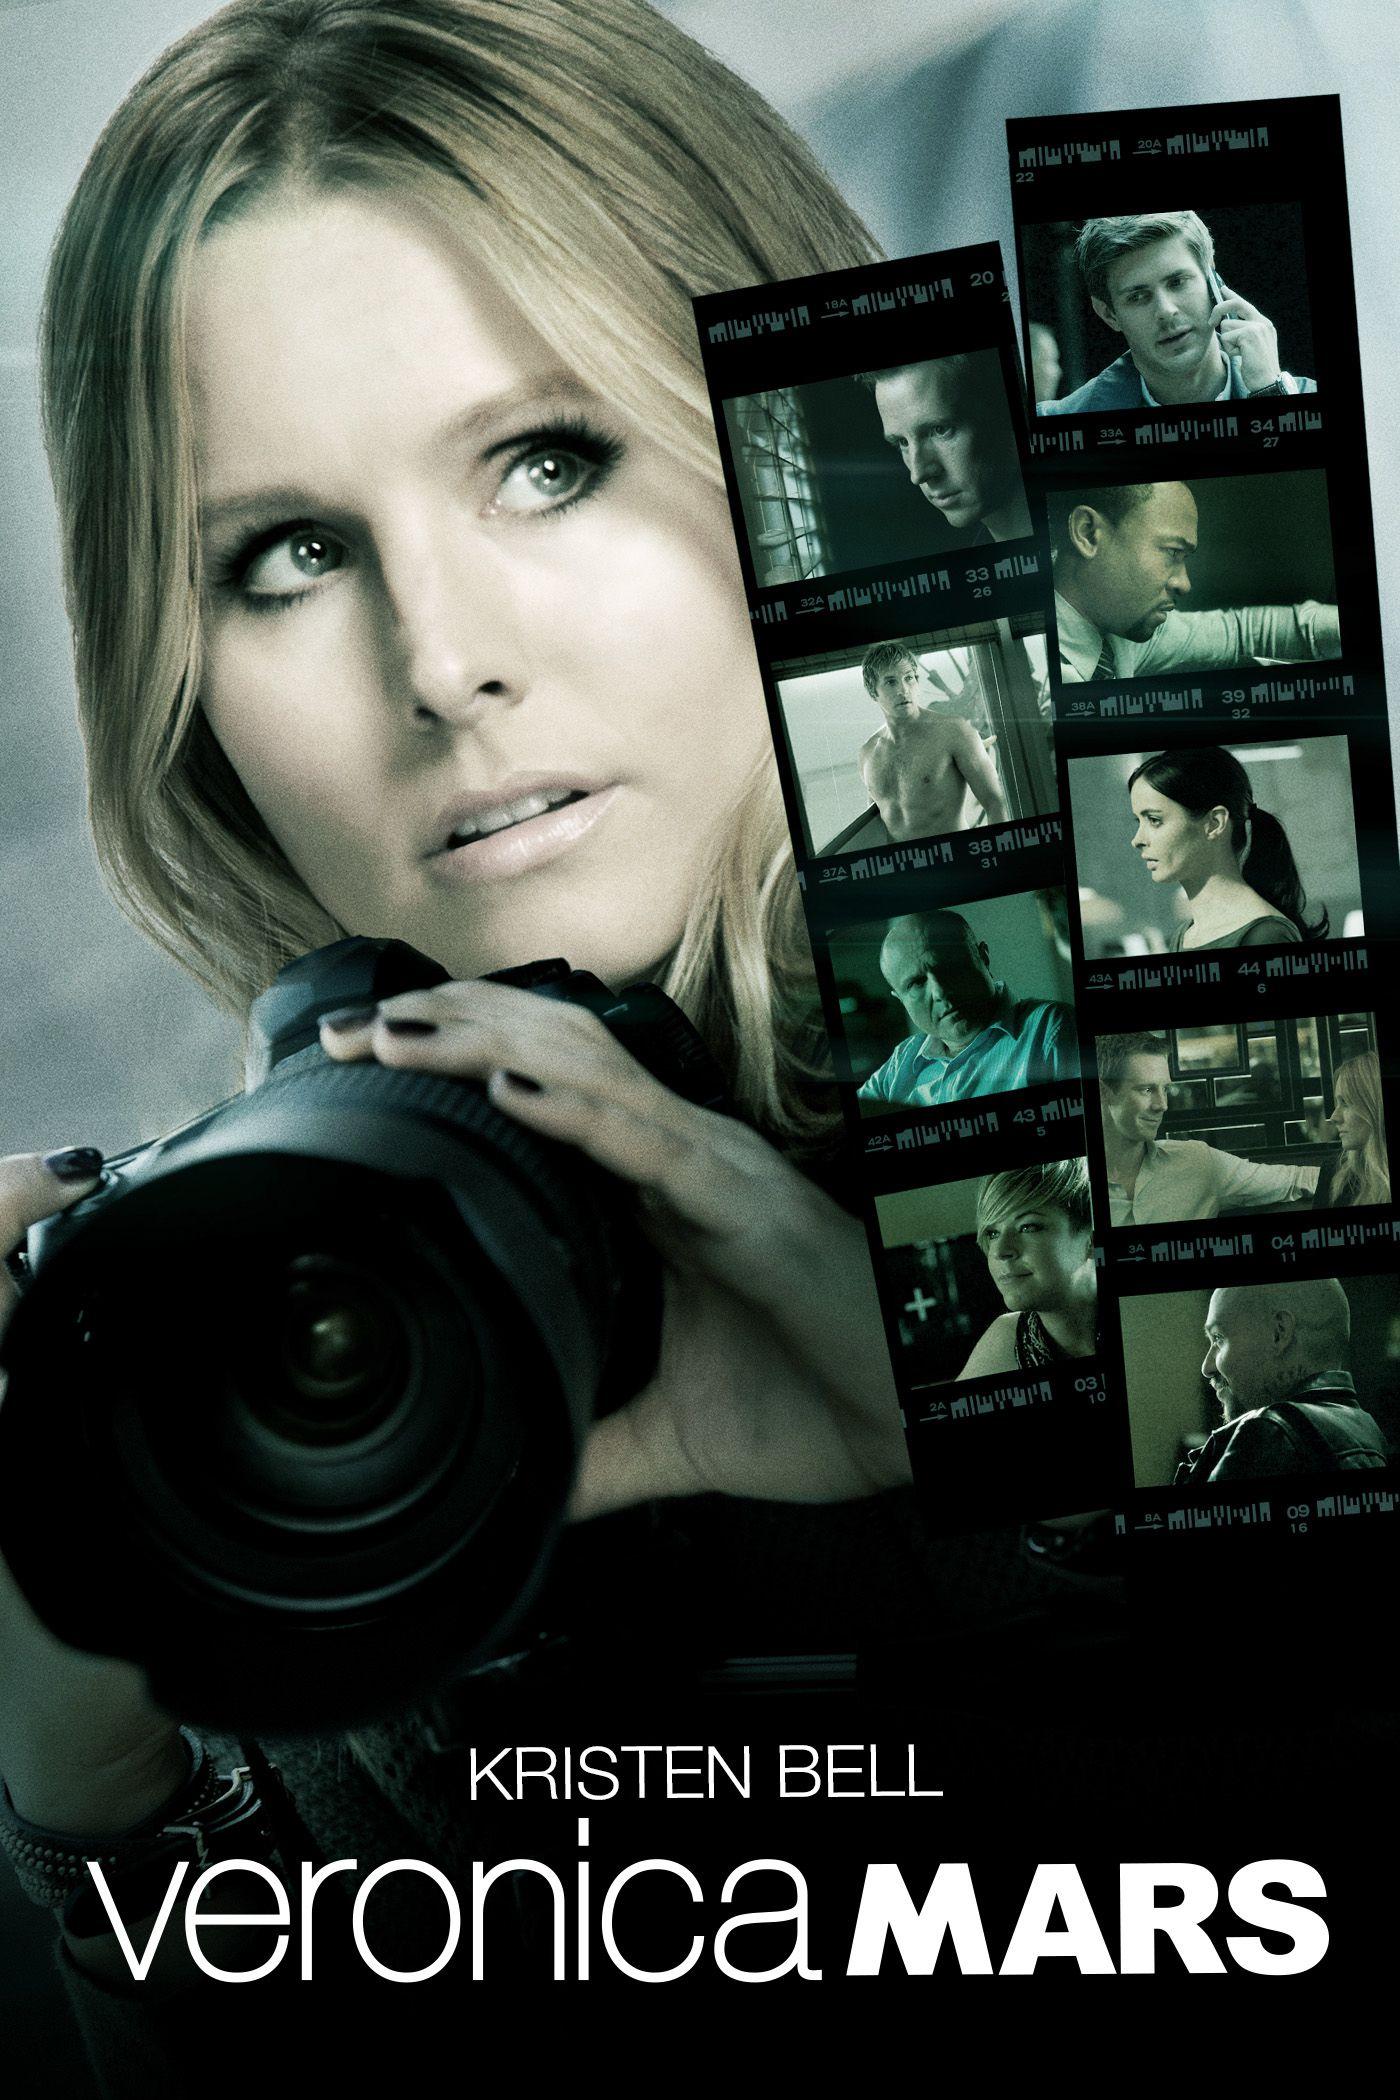 Veronica Mars - Film (2014)